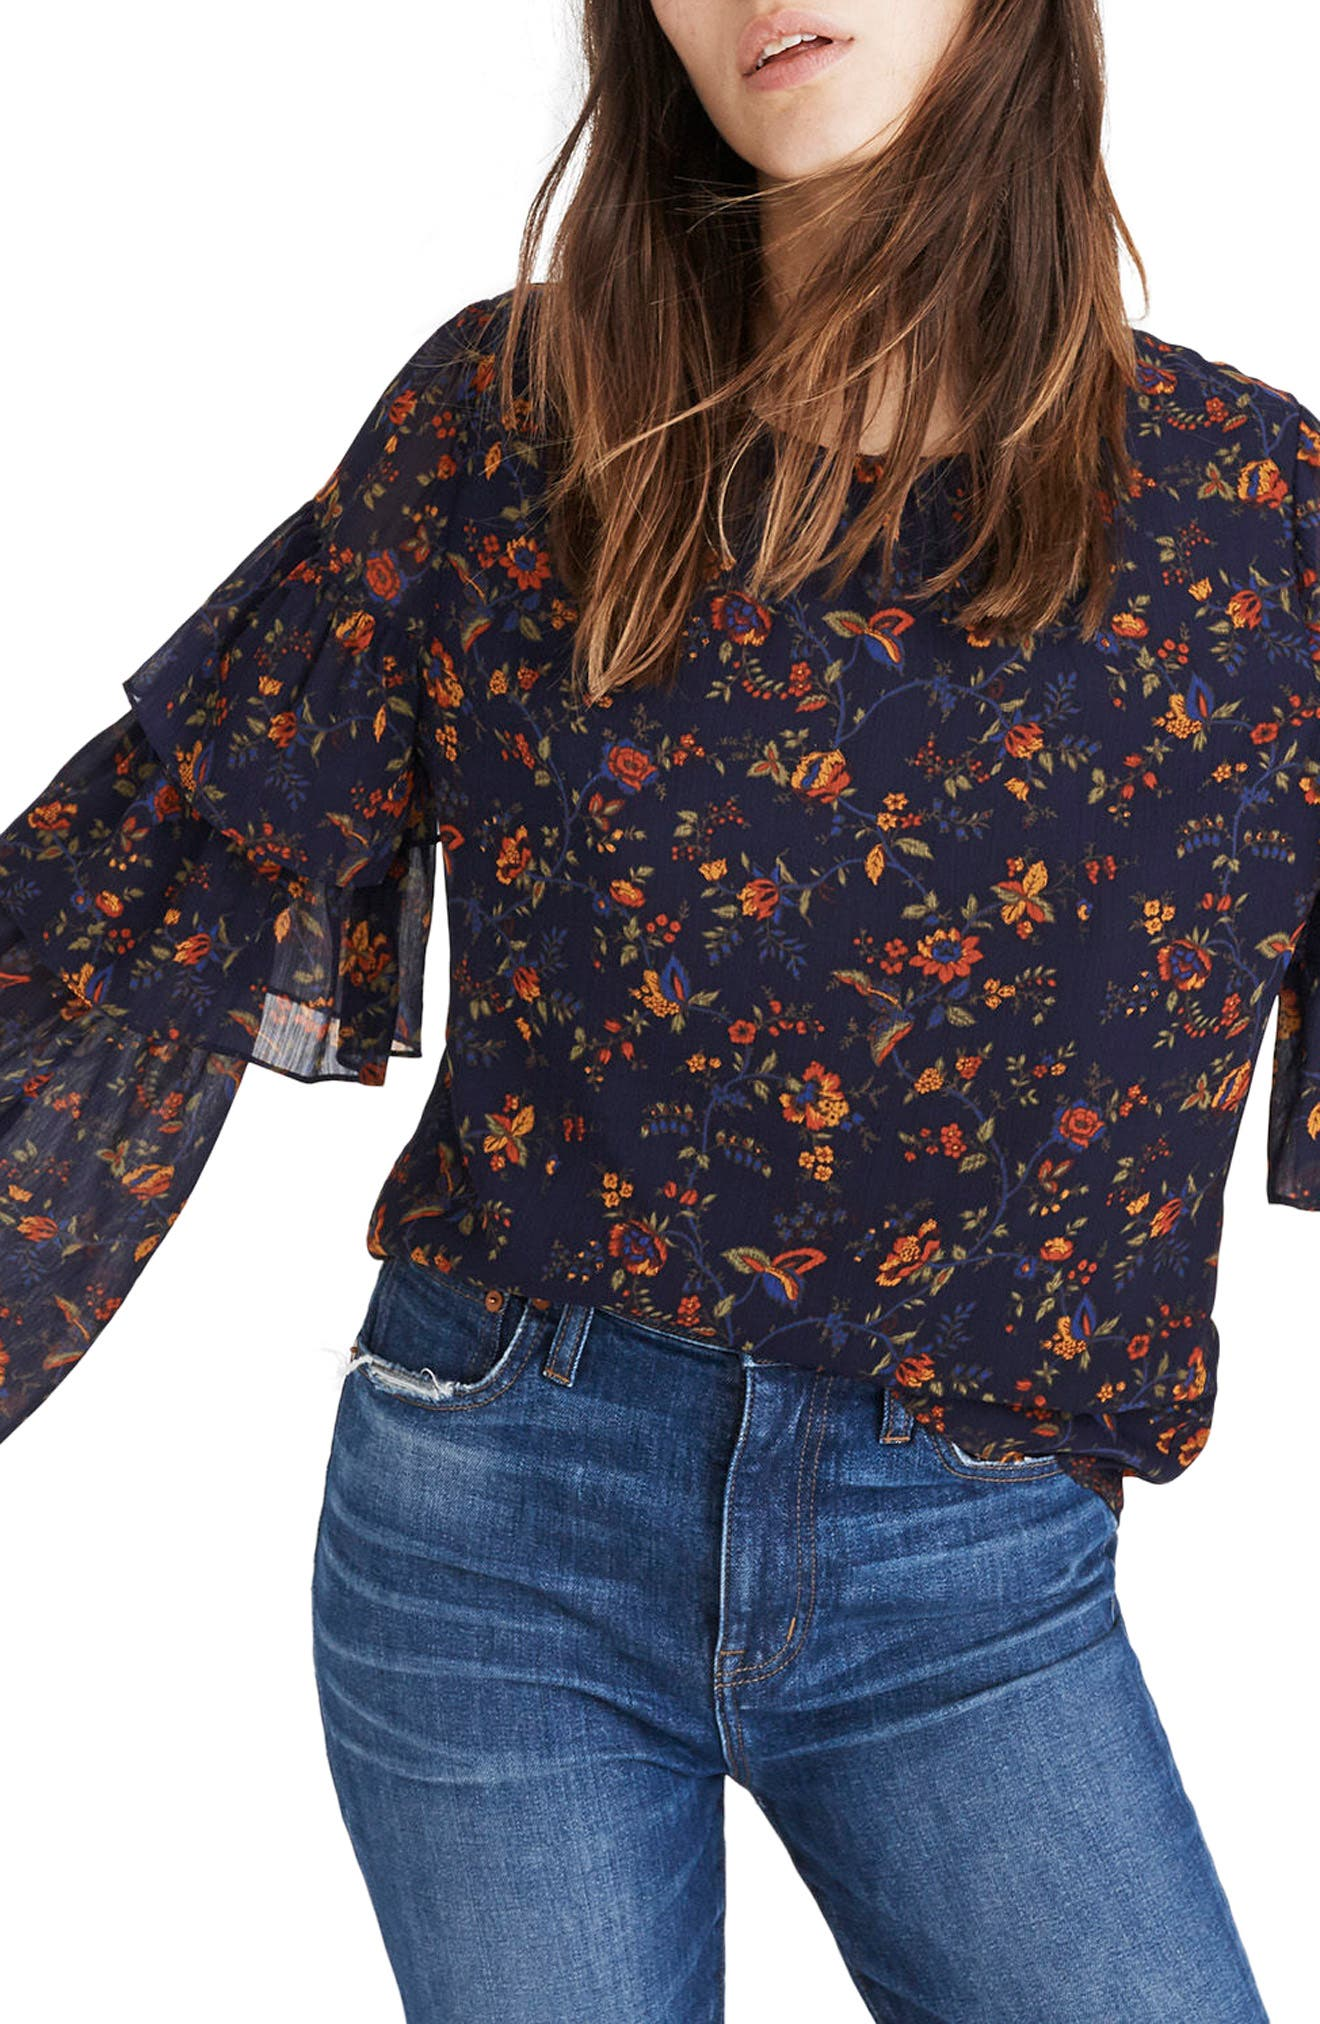 Alternate Image 1 Selected - Madewell Ruffle Sleeve Top